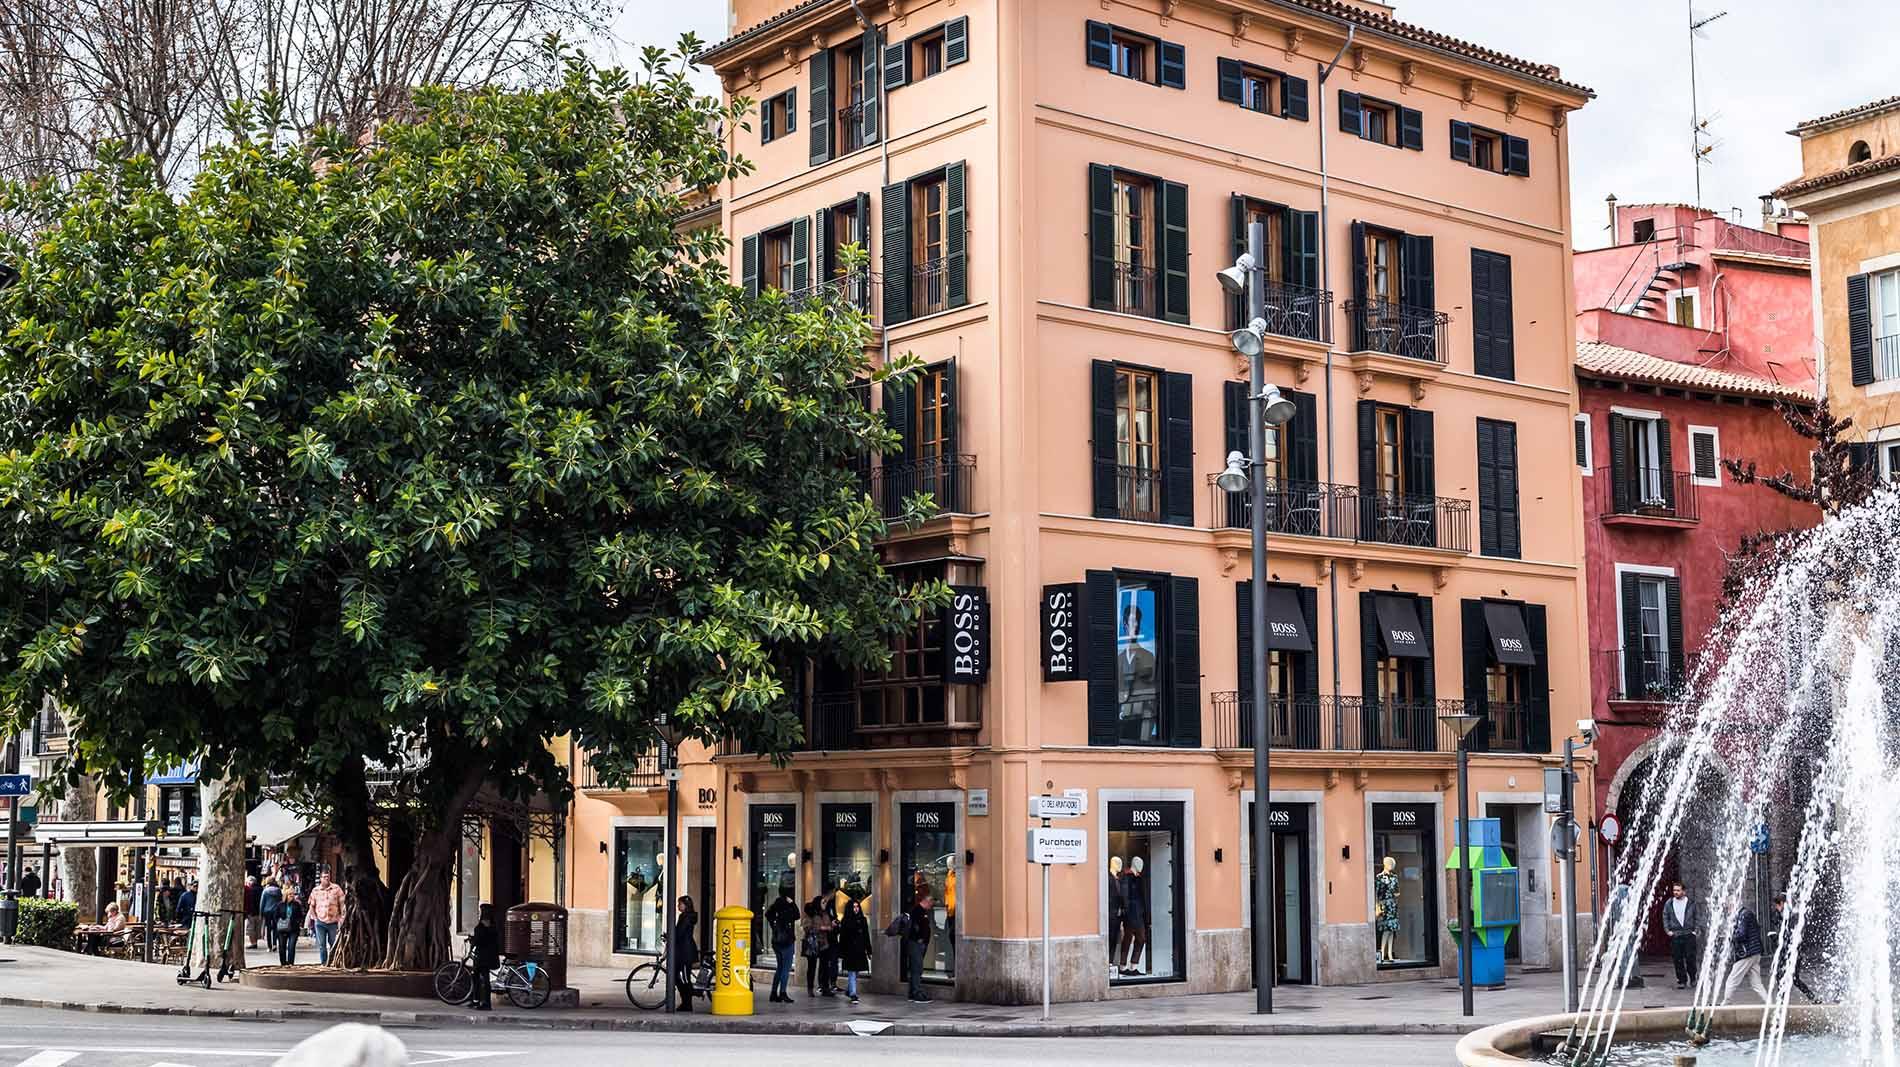 Borne-Suites-Apartamentos-Alquiler-Palma-de-Mallorca